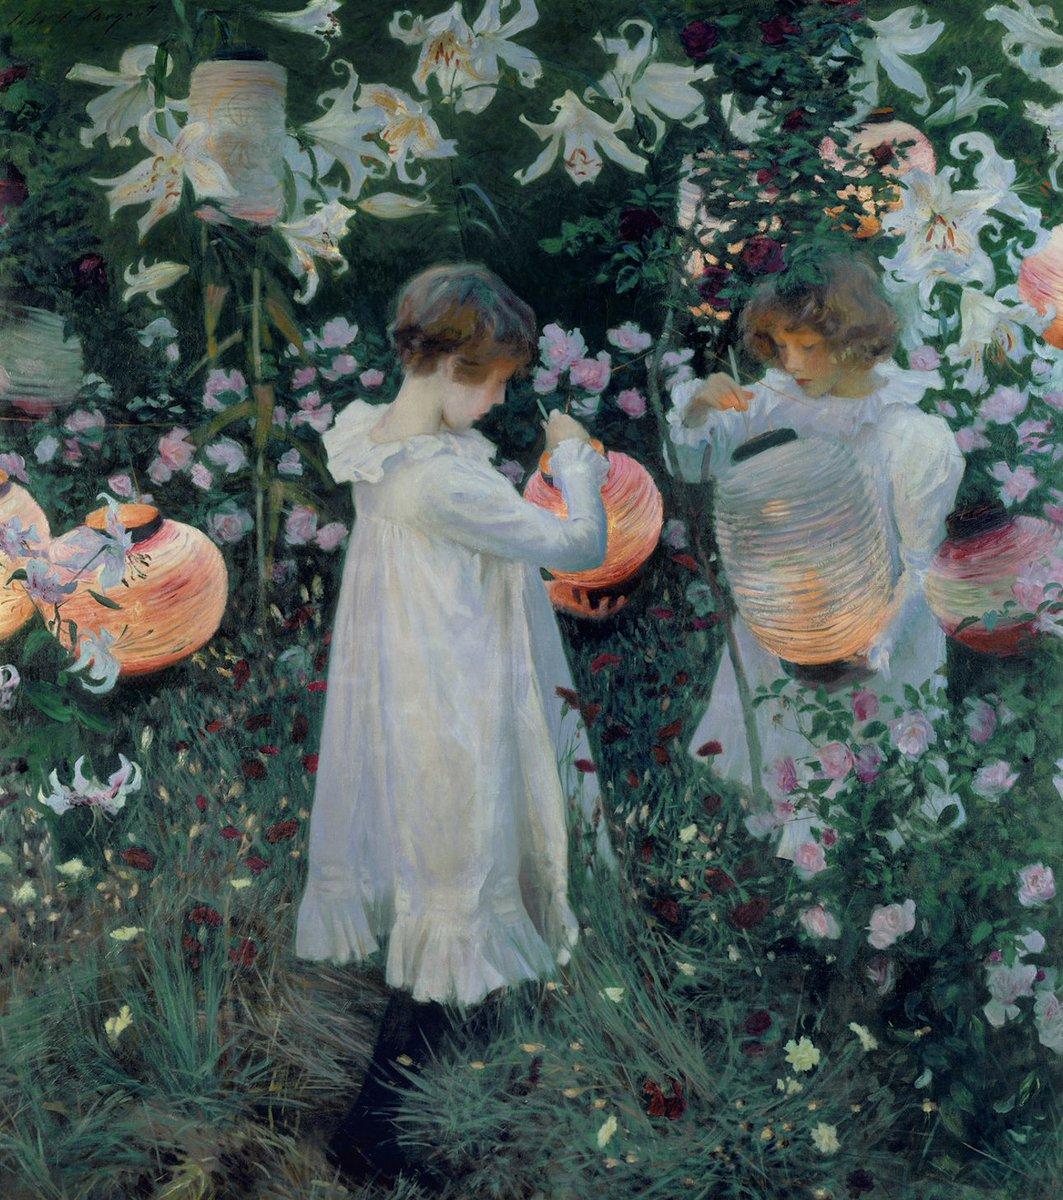 Let's dream of an endless summer. 🌼🌿  🖼: John Singer Sargent, 'Carnation, Lily, Lily, Rose', 1885-6.  #thursdayvibes #bozar https://t.co/gGJqxDtSCI